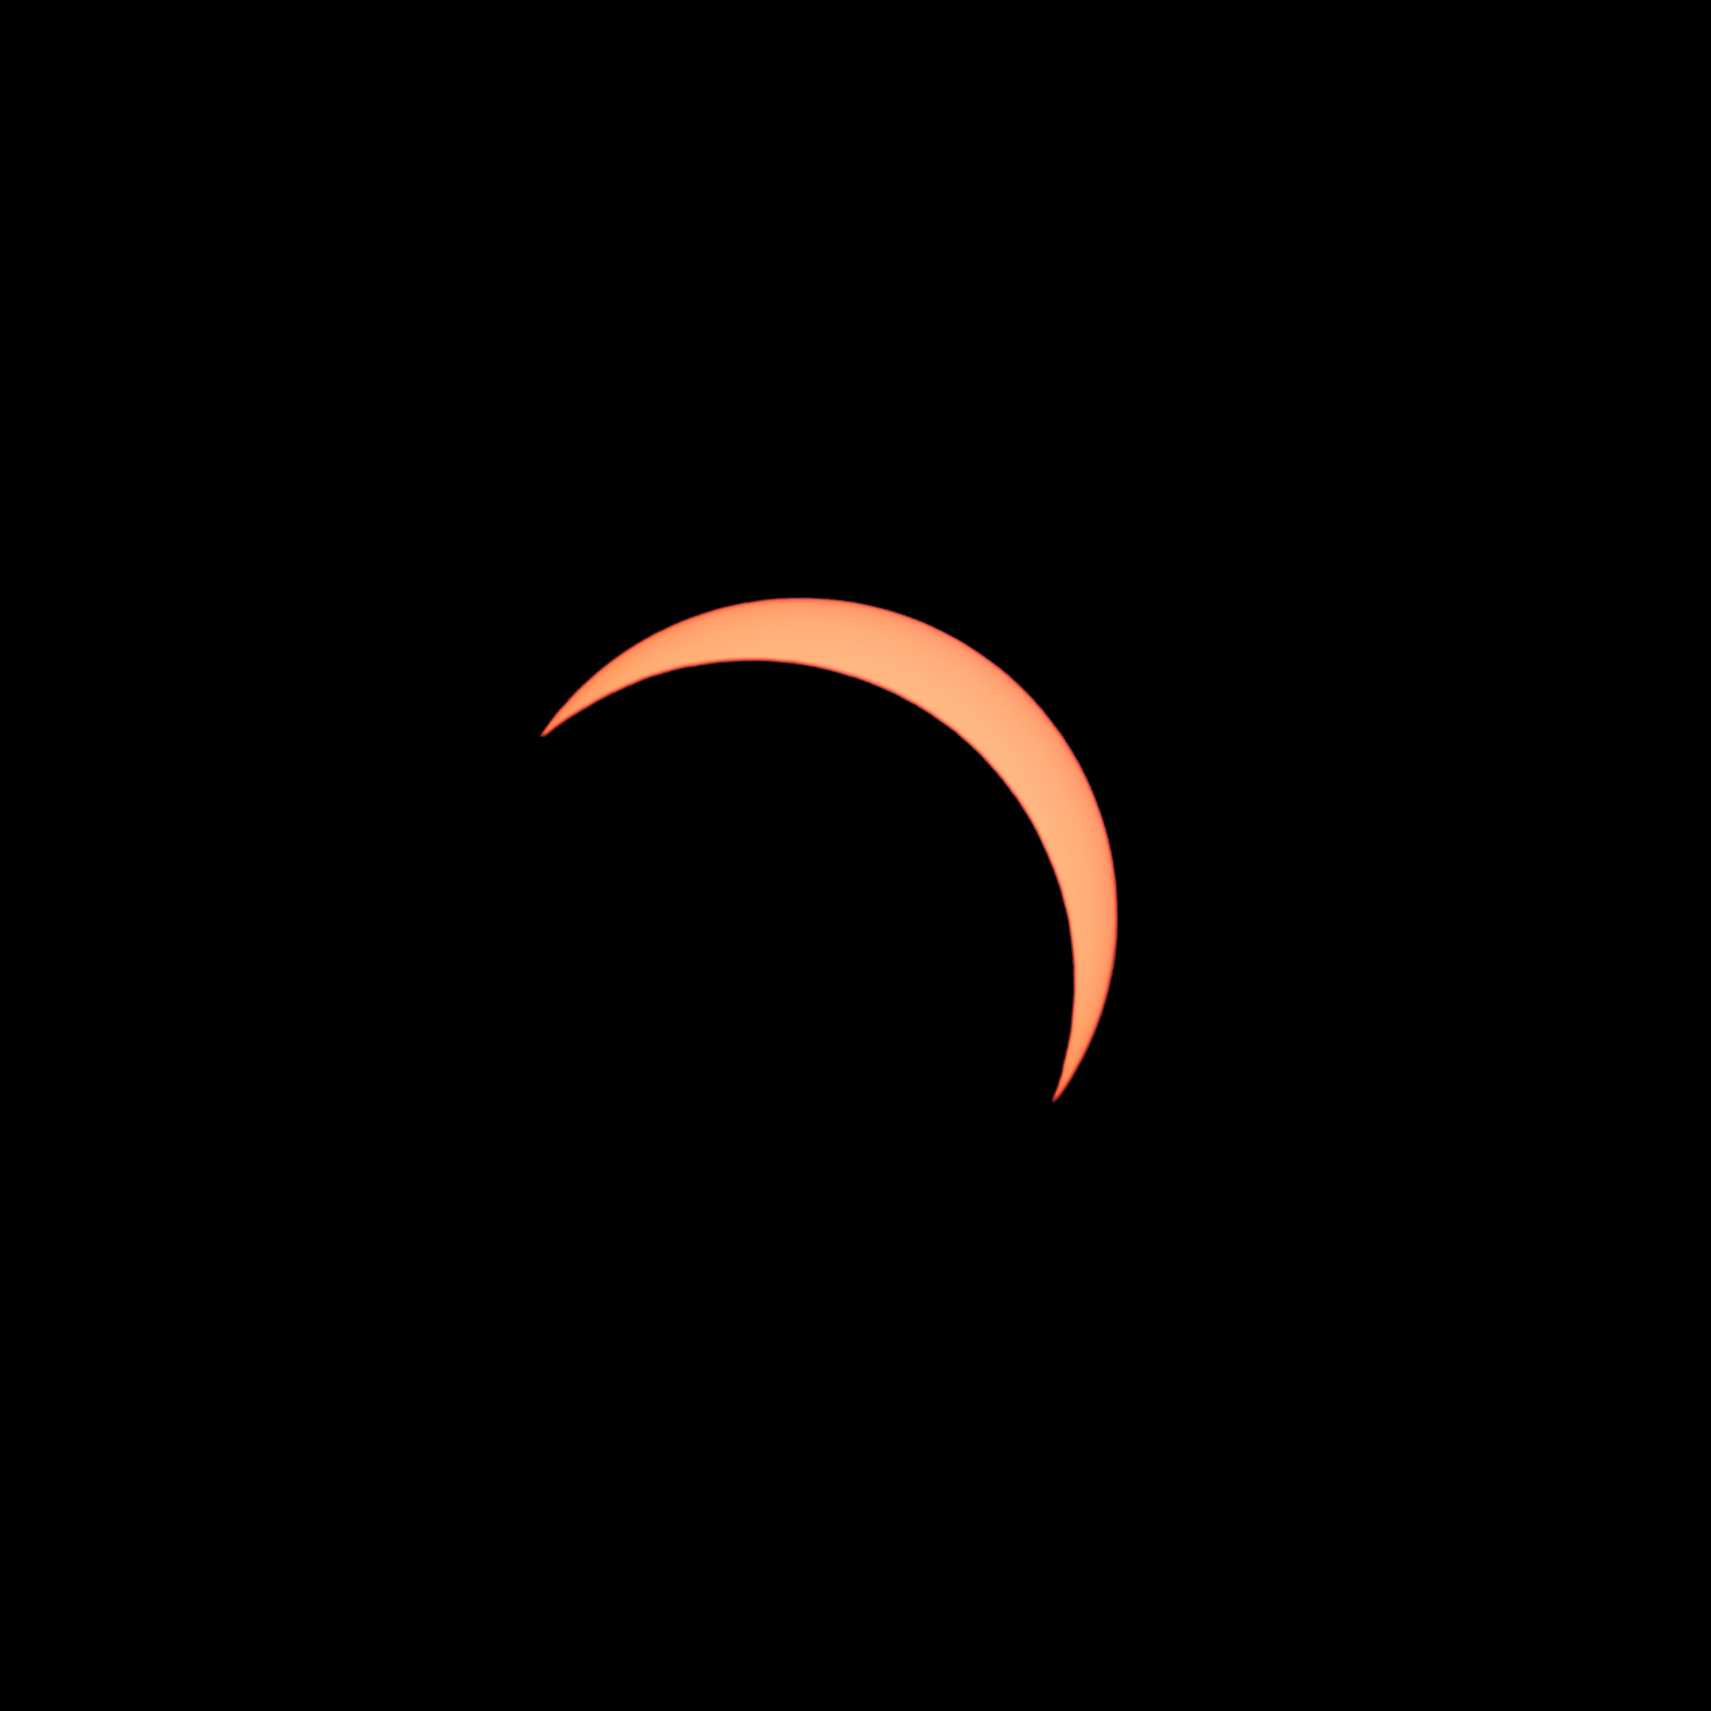 20170821_eclissi-parzialità-uscita-3quarter_AlessandroDimai